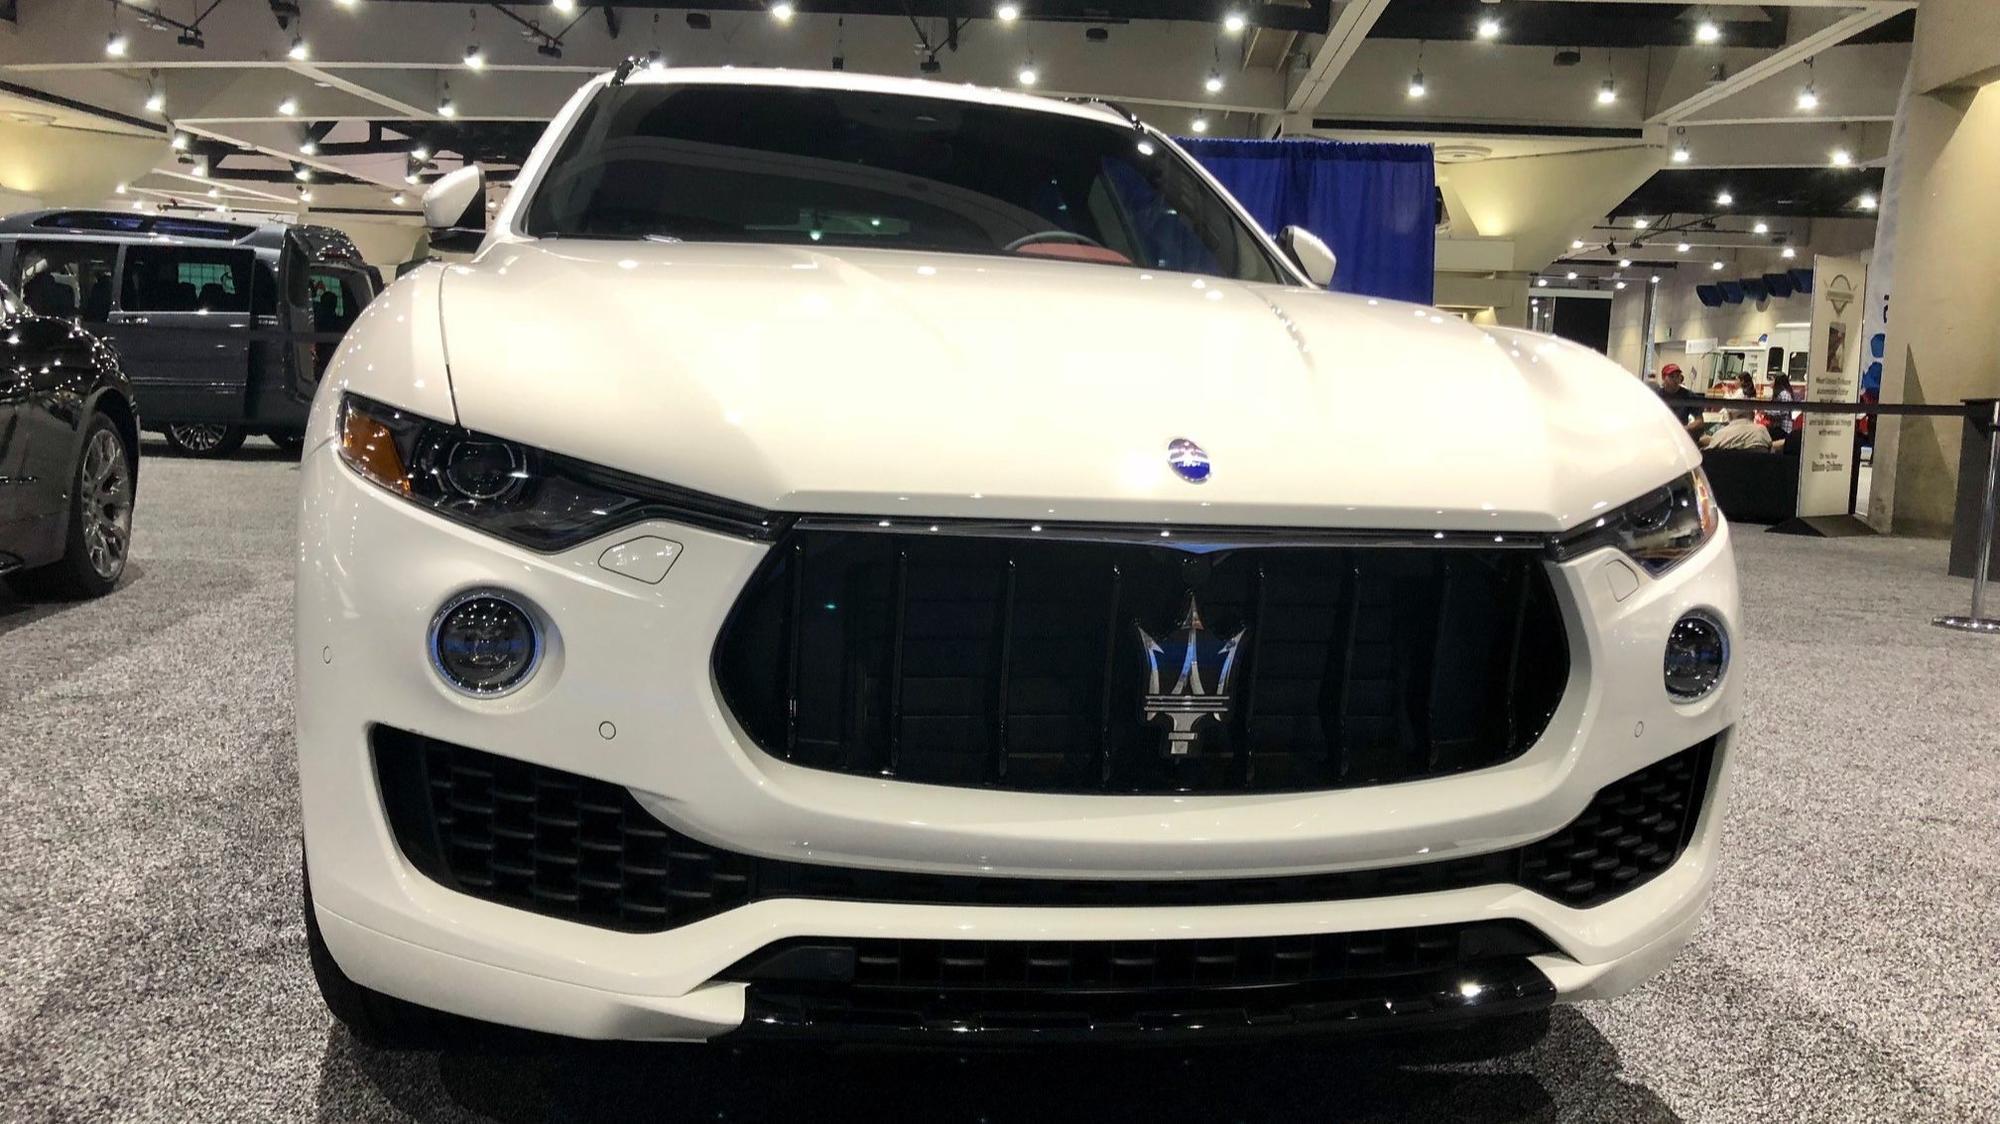 San Diego International Auto Show SUVs Move Into The Luxury Lane - Sd car show